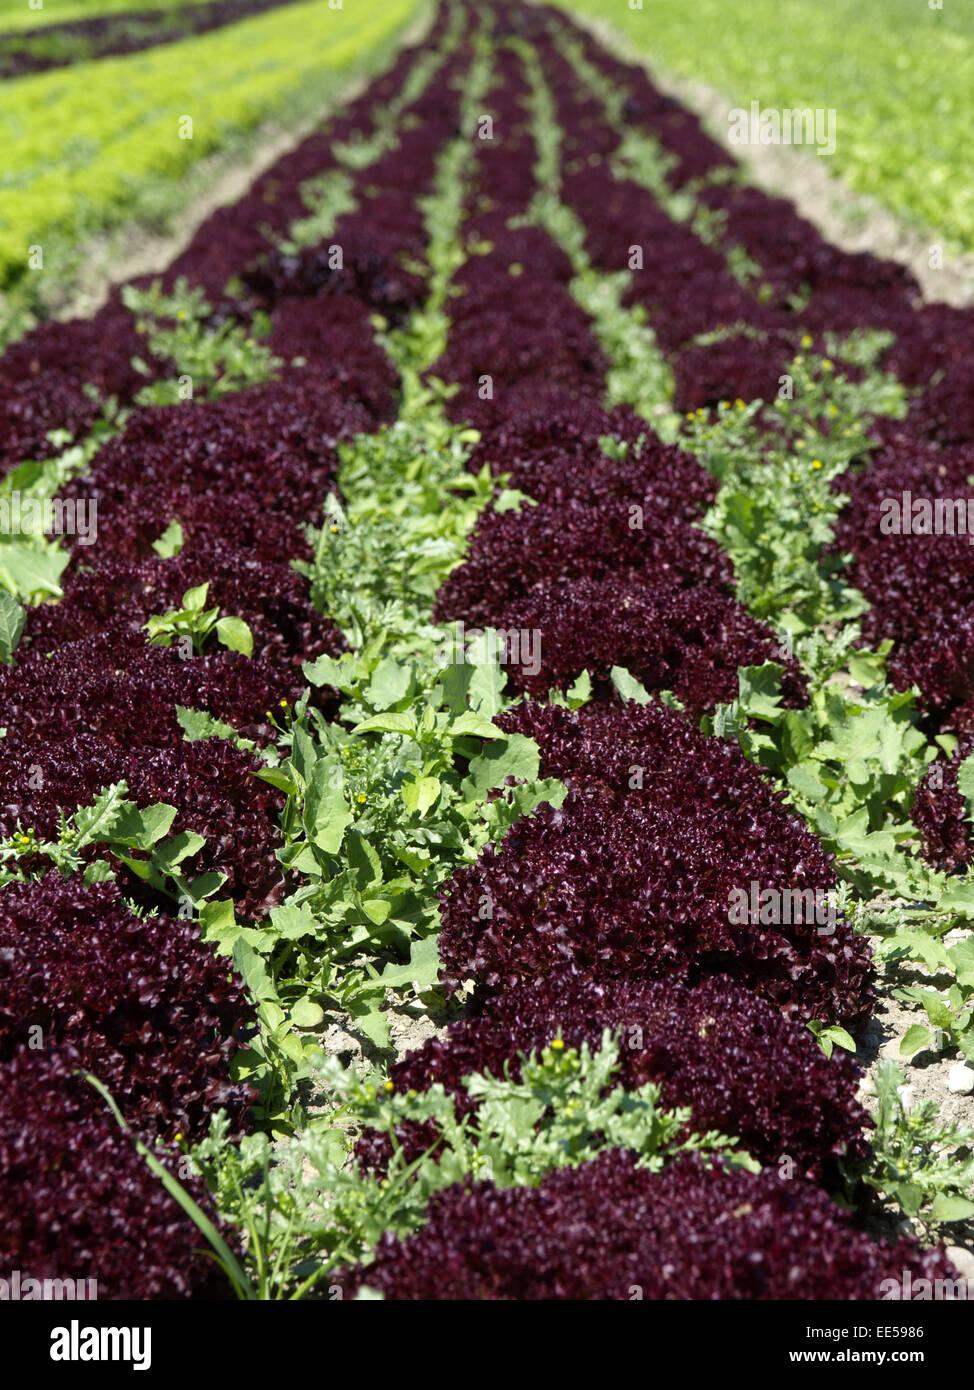 salat lollo rosso salatfeld biologischer anbau salatanbau detail kopfsalat feld pflanzen. Black Bedroom Furniture Sets. Home Design Ideas